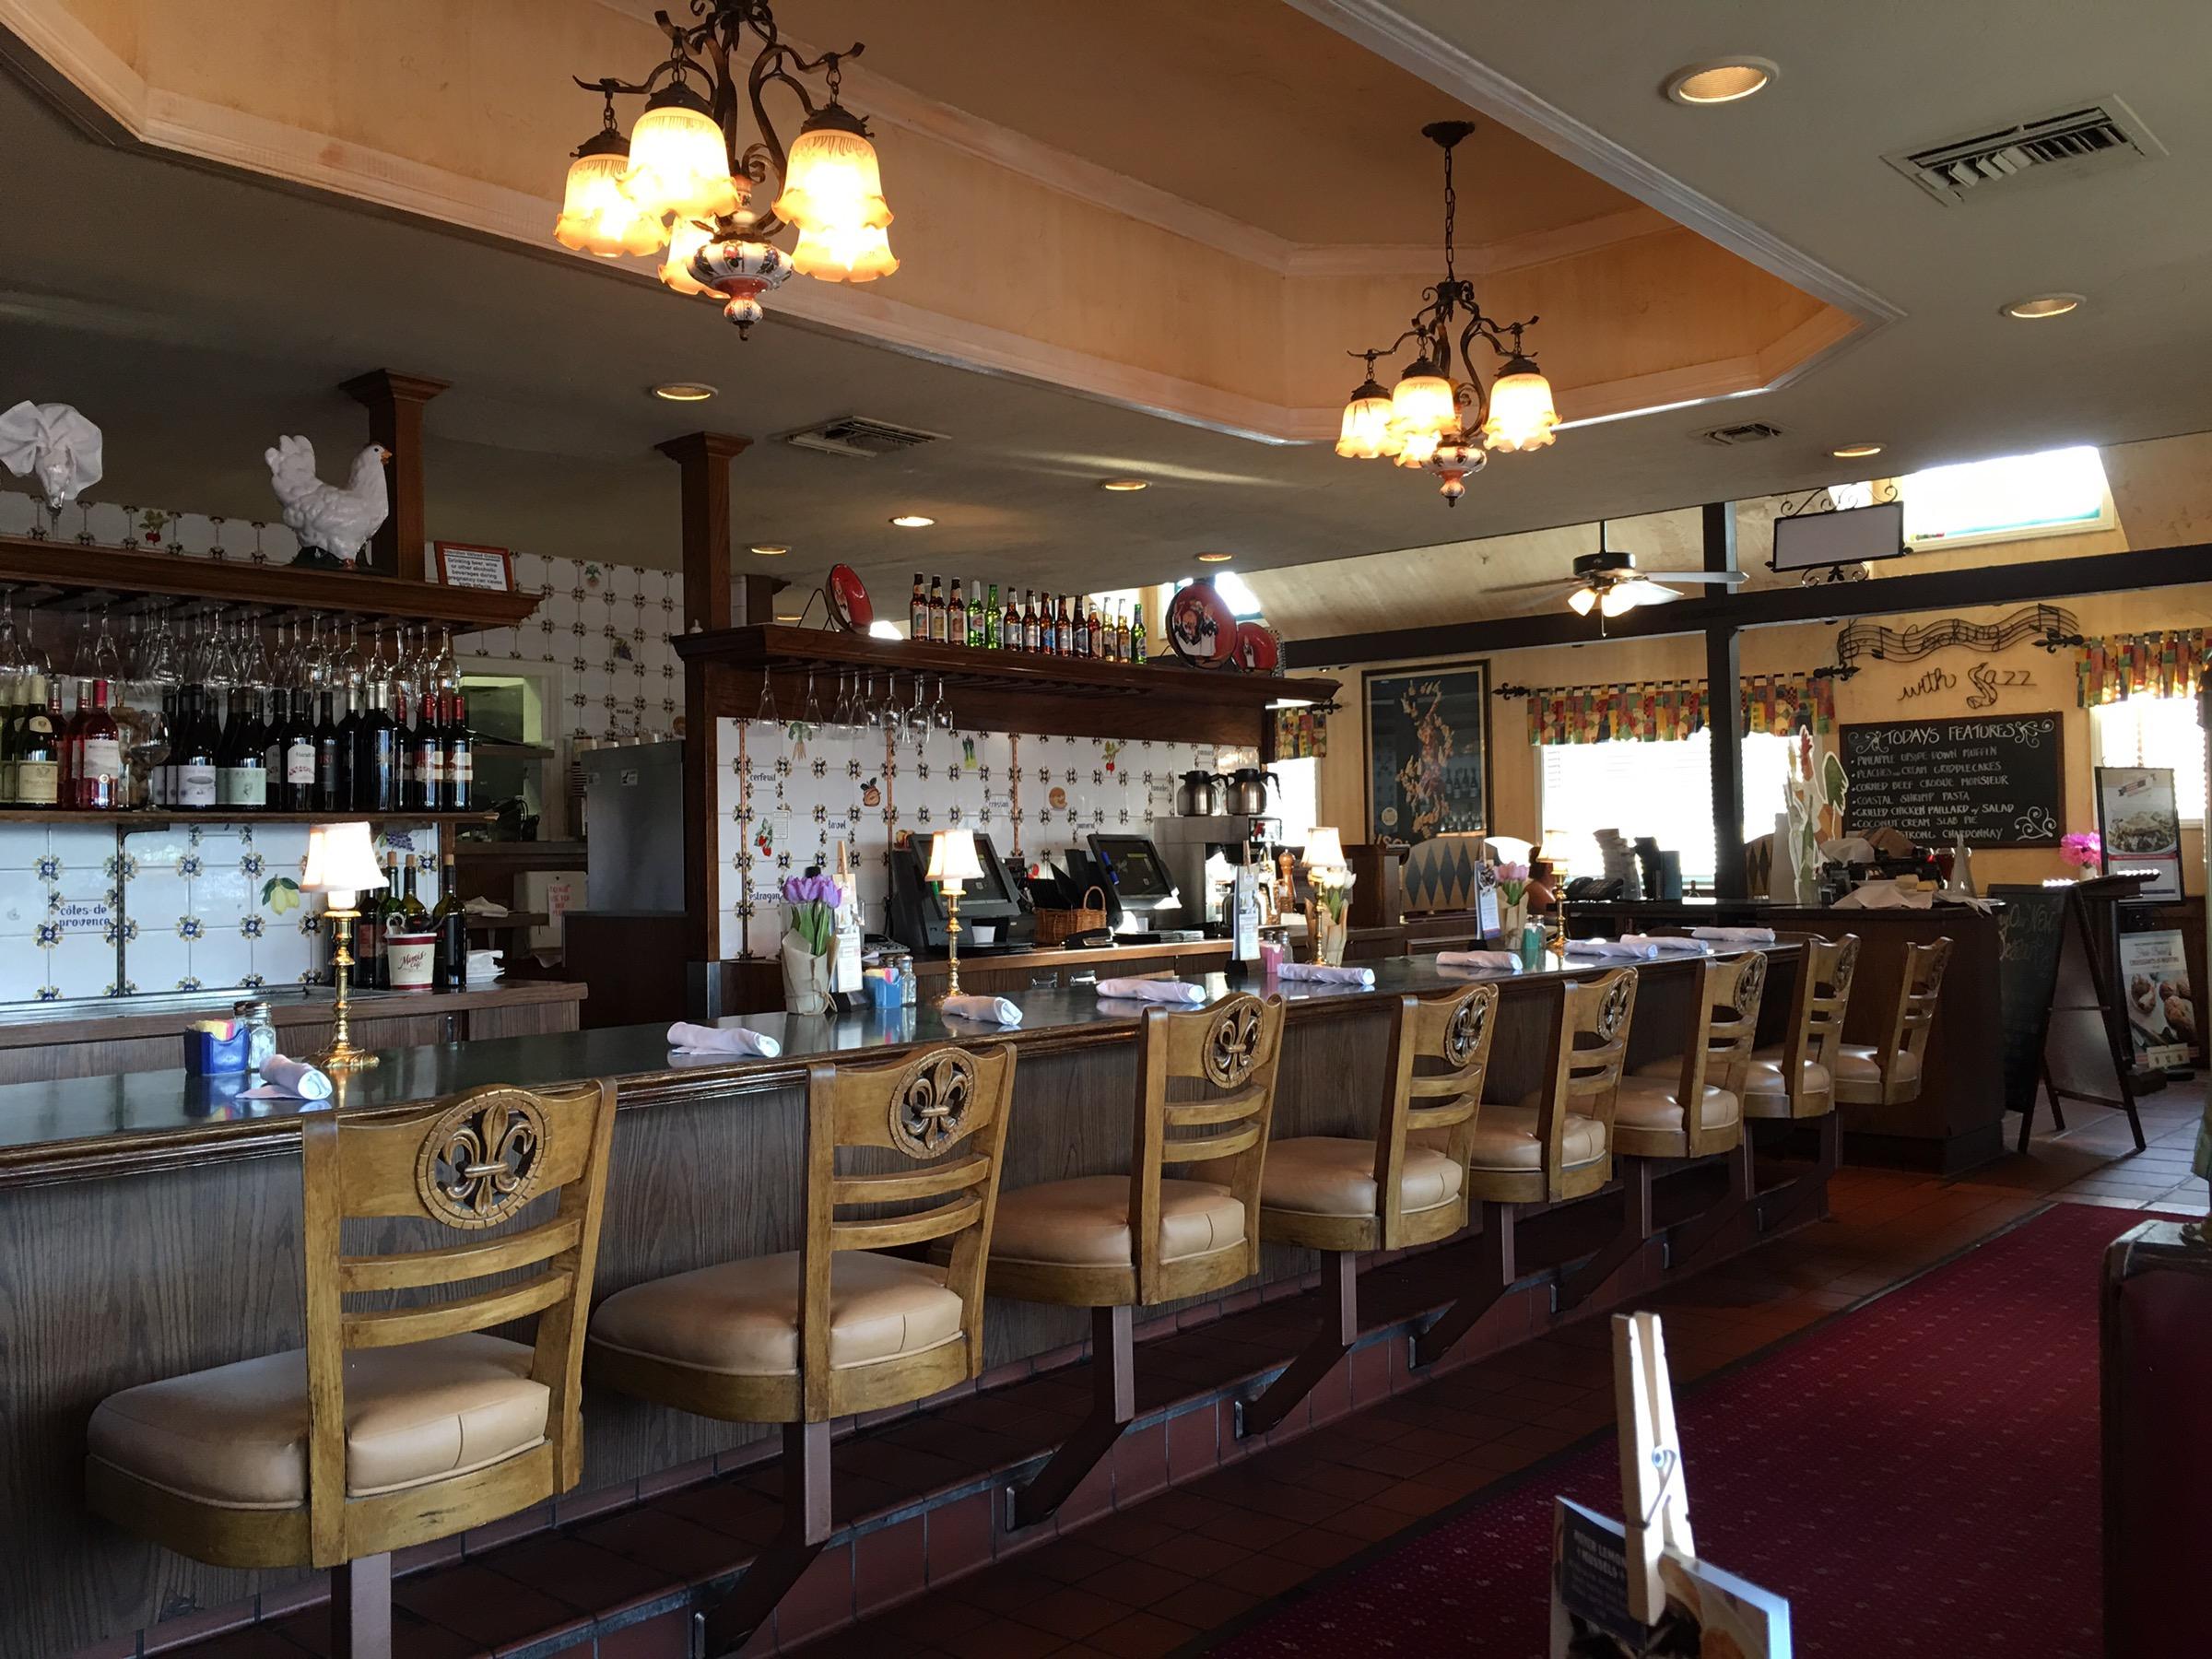 Anaheim: Mimi's Cafe – Call Me Mochelle